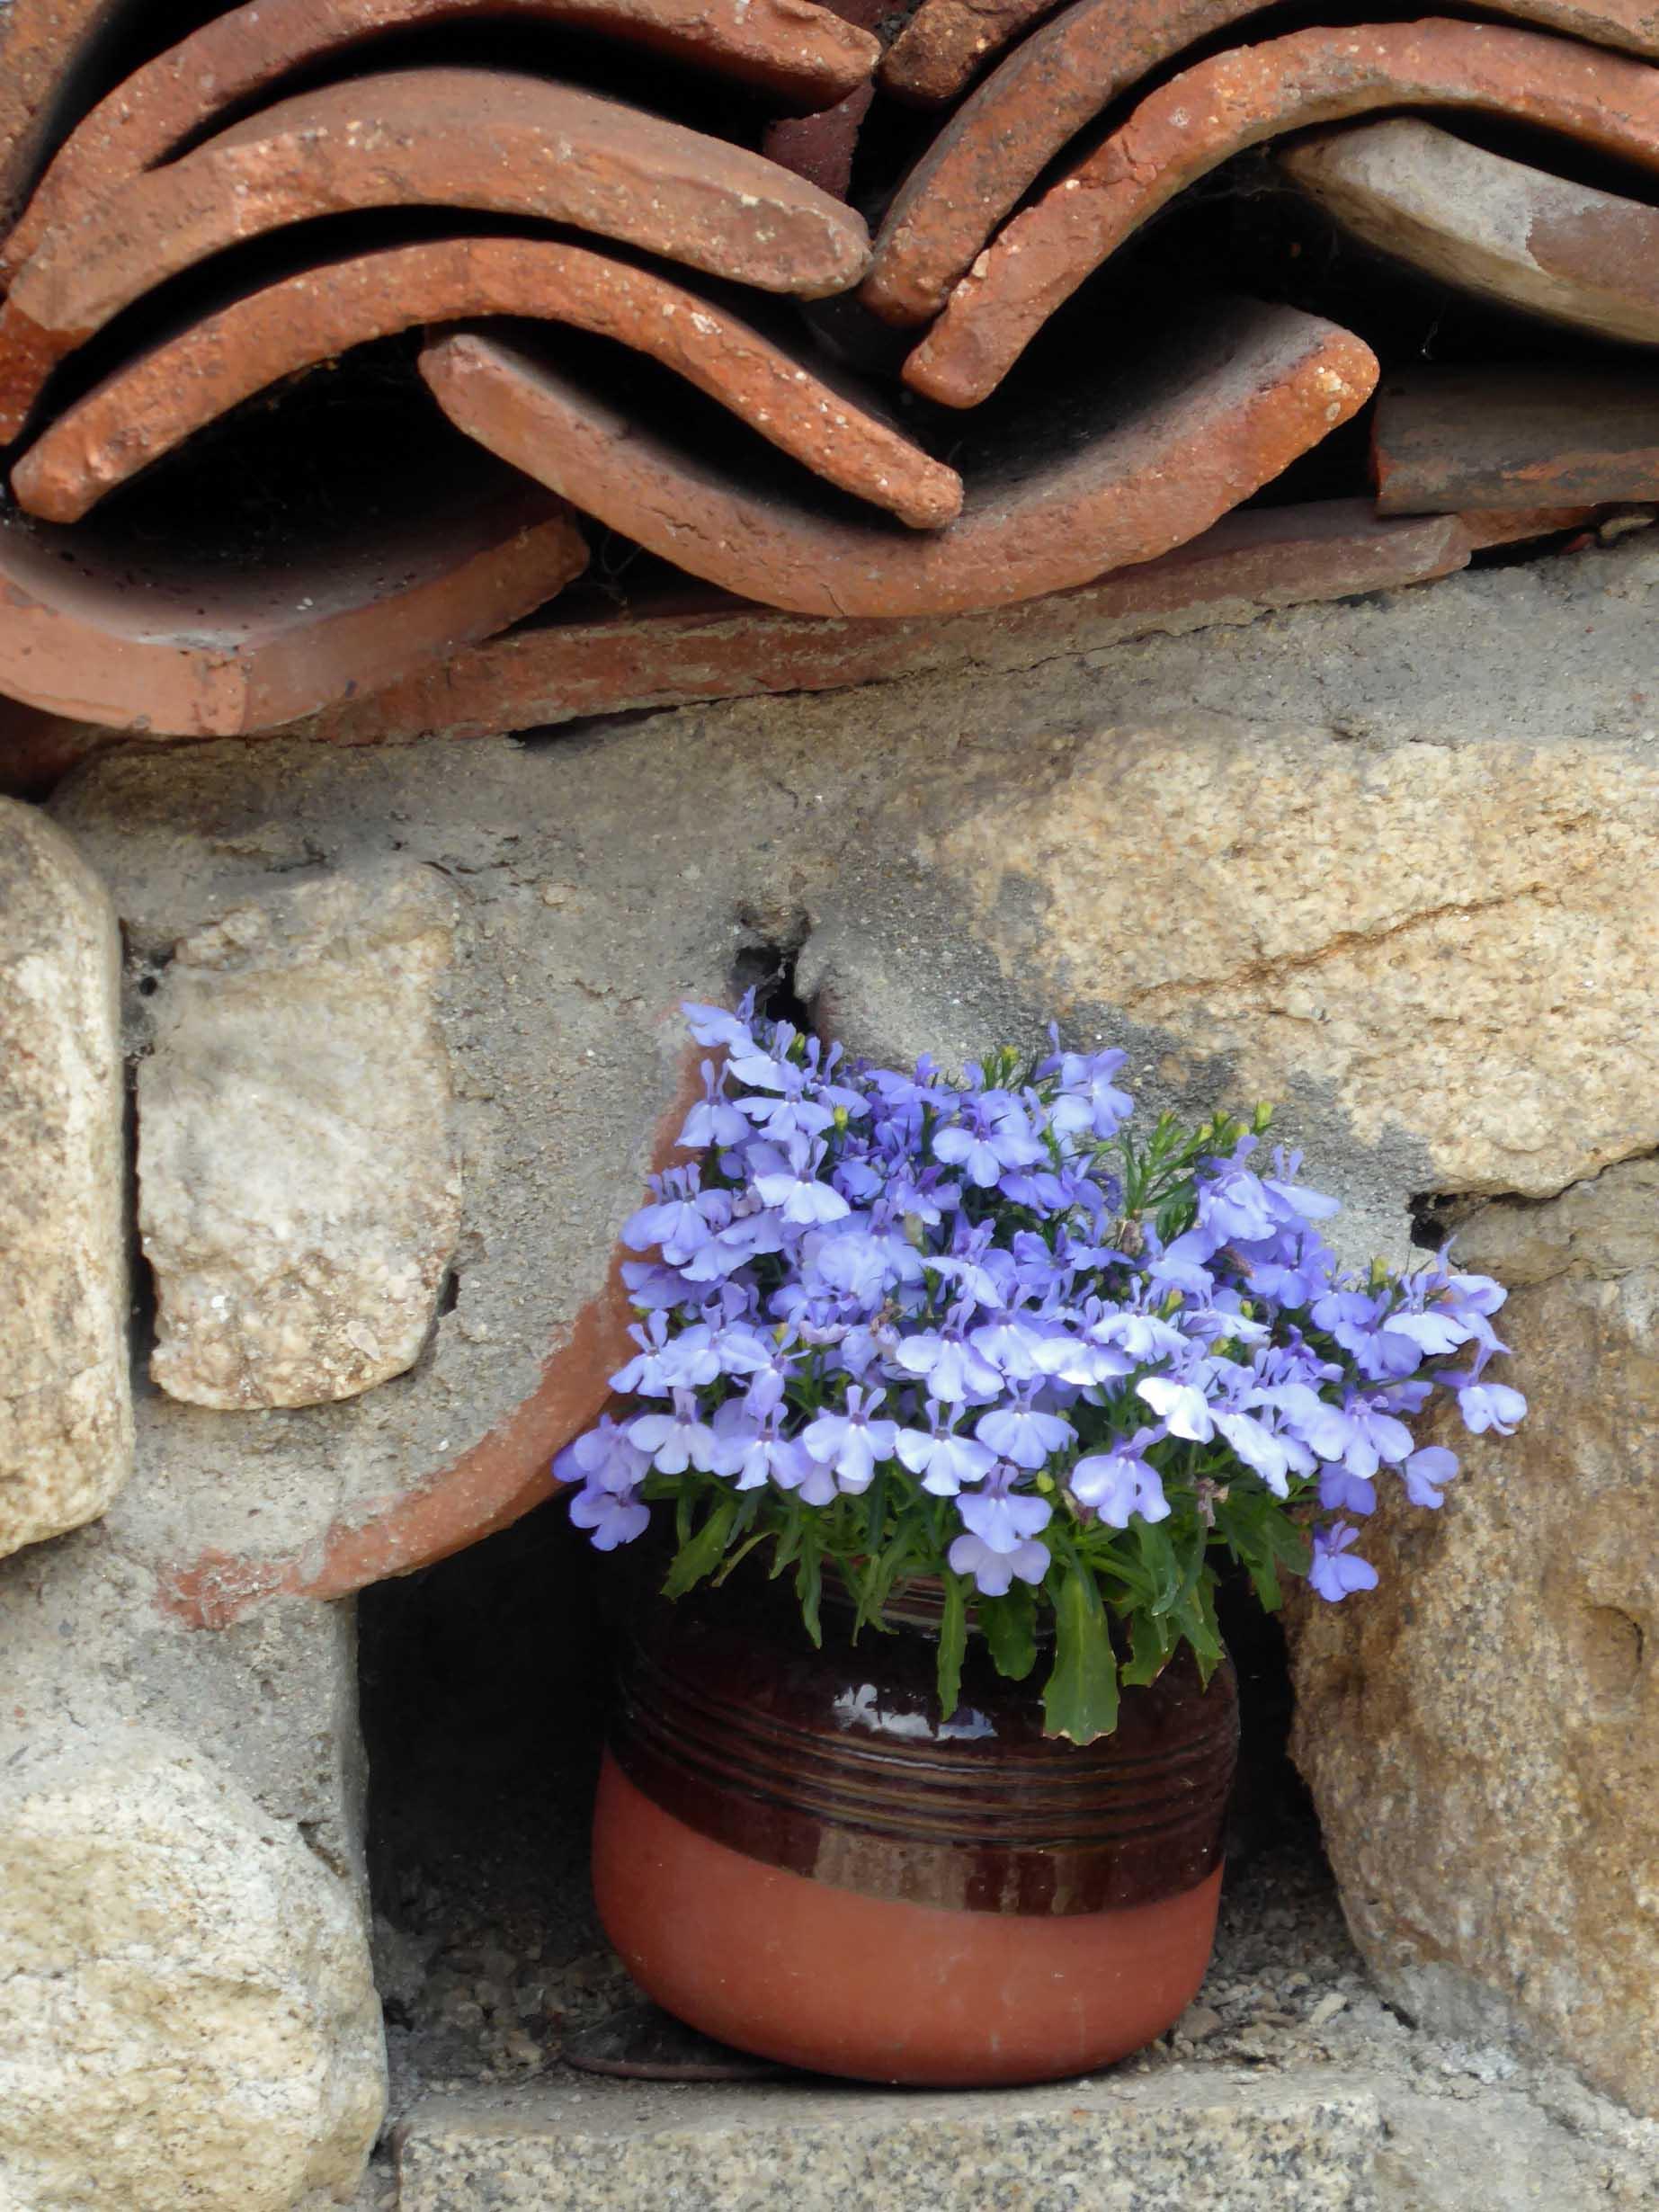 Purple flowers in a pot on a wall